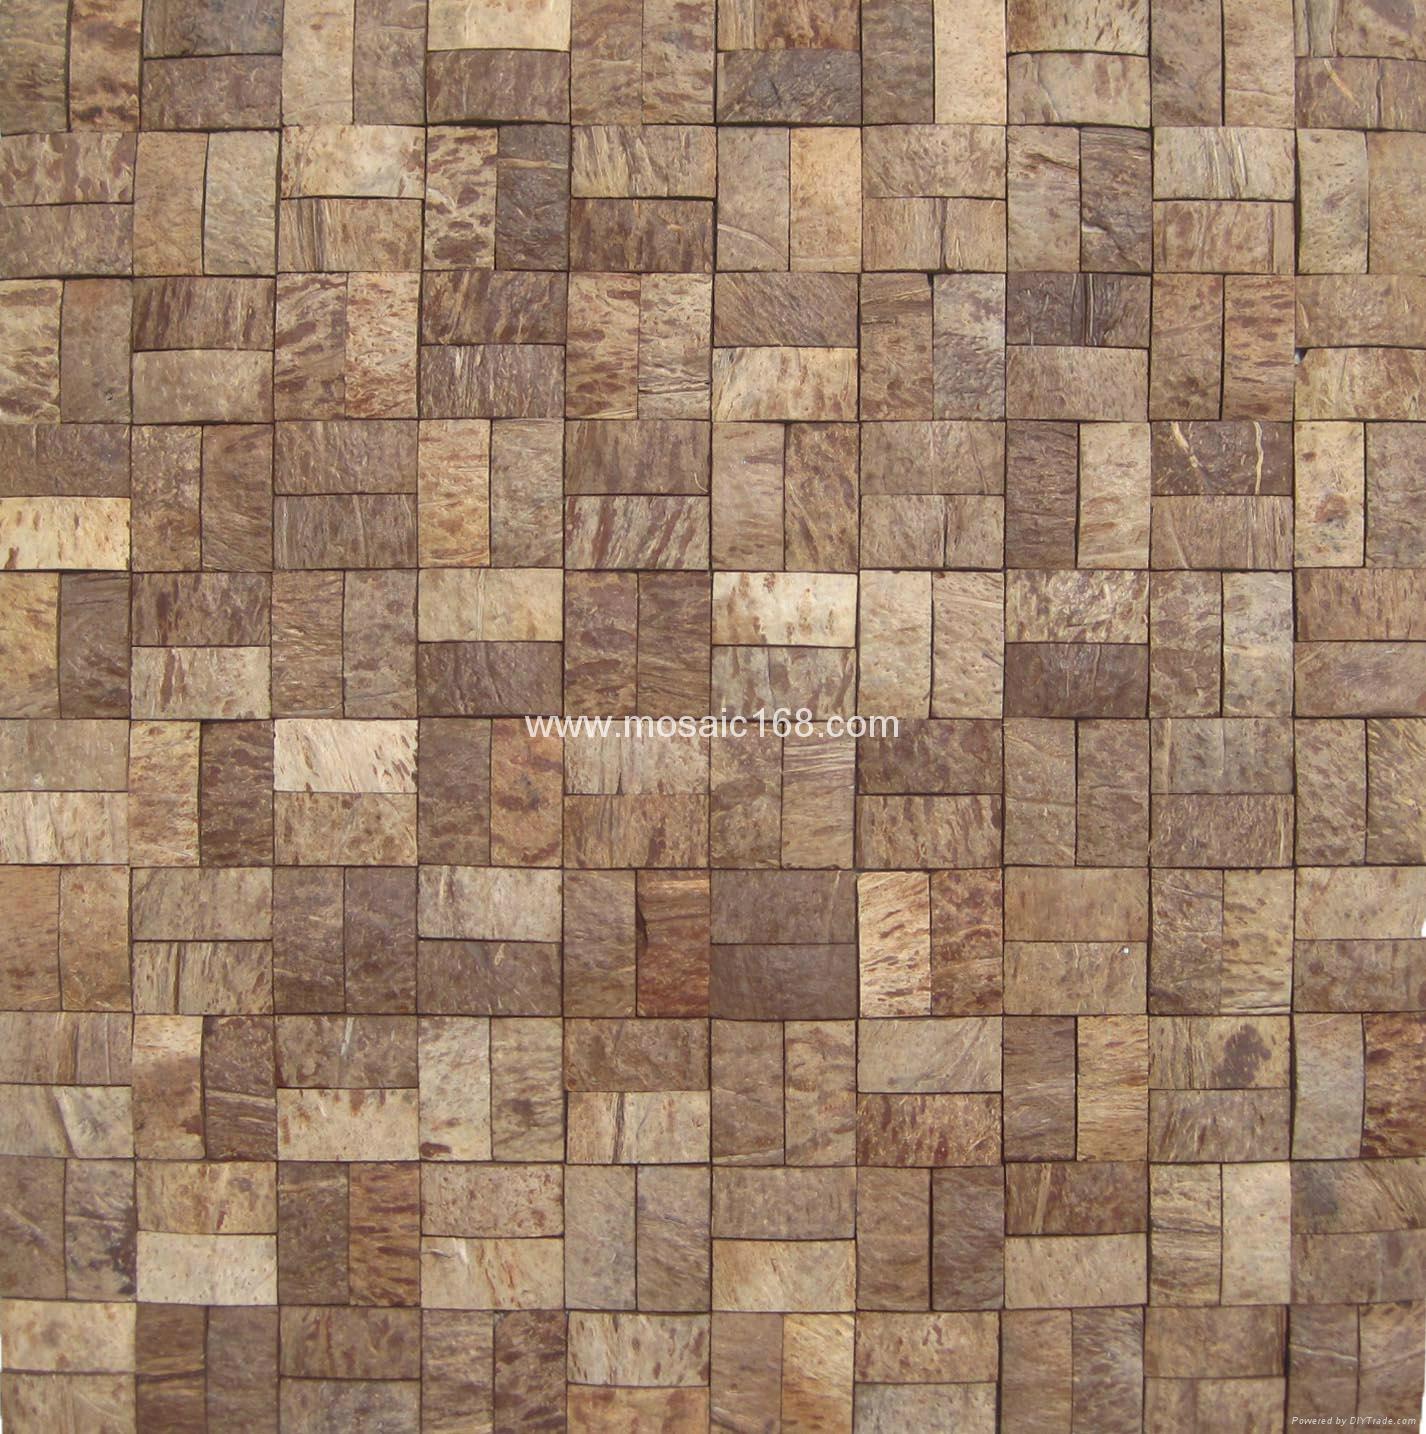 Brick Design Mosaic Coconut Tiles China Manufacturer